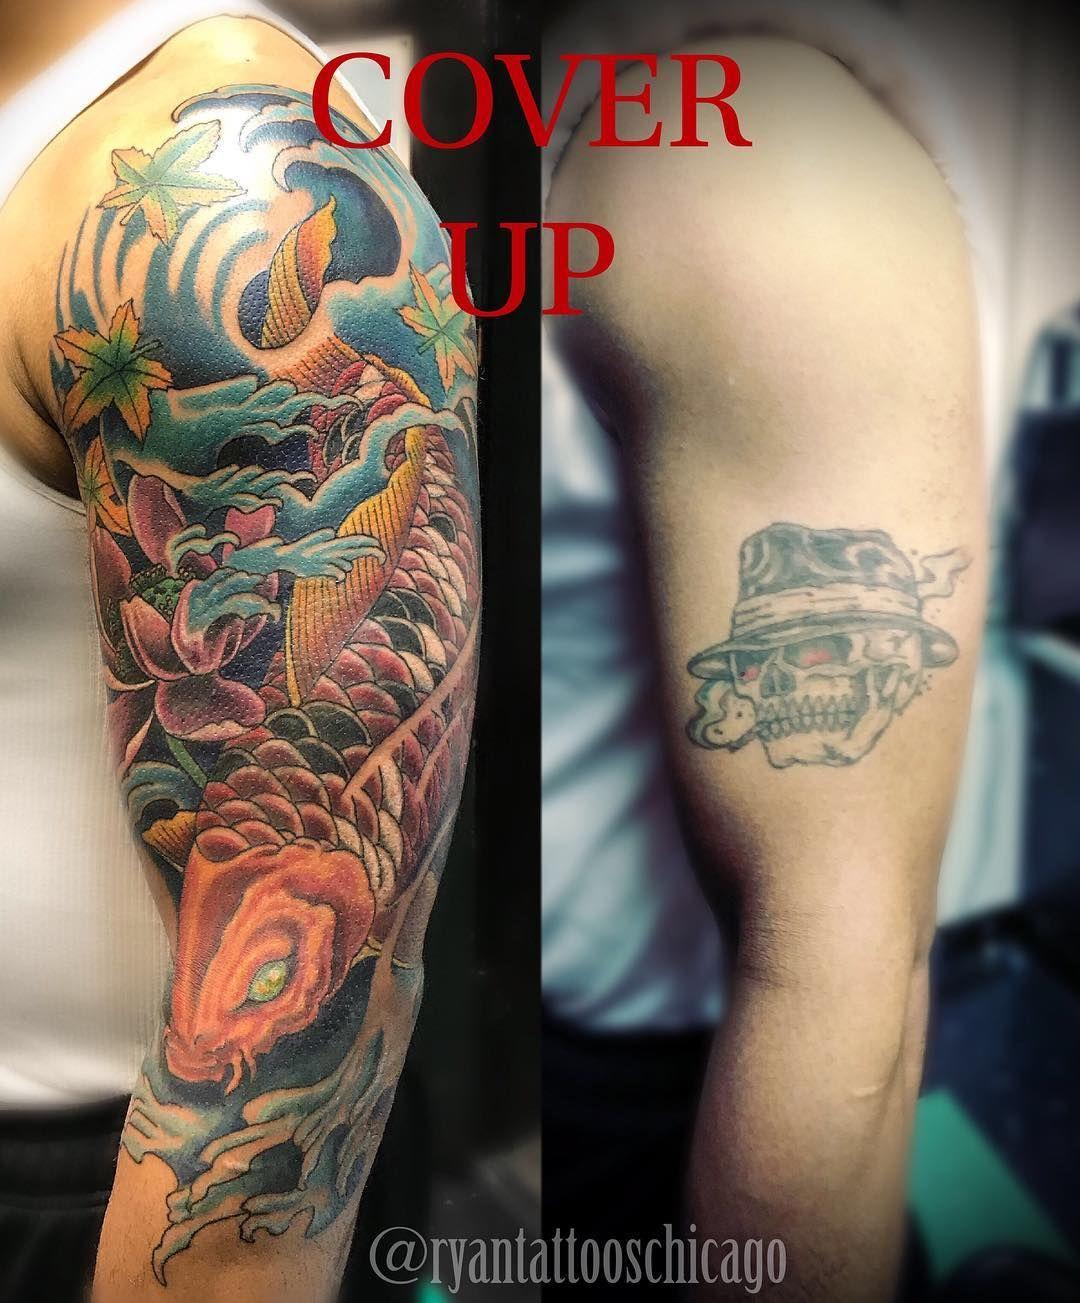 Coy Fish Cover Up Coyfish Coyfishtattoo Colortattoo Colortattoos Coveruptattoo Coveruptattoos Halfsleevetatt In 2020 Cover Up Tattoos Cover Up Tattoo Ink Tattoo